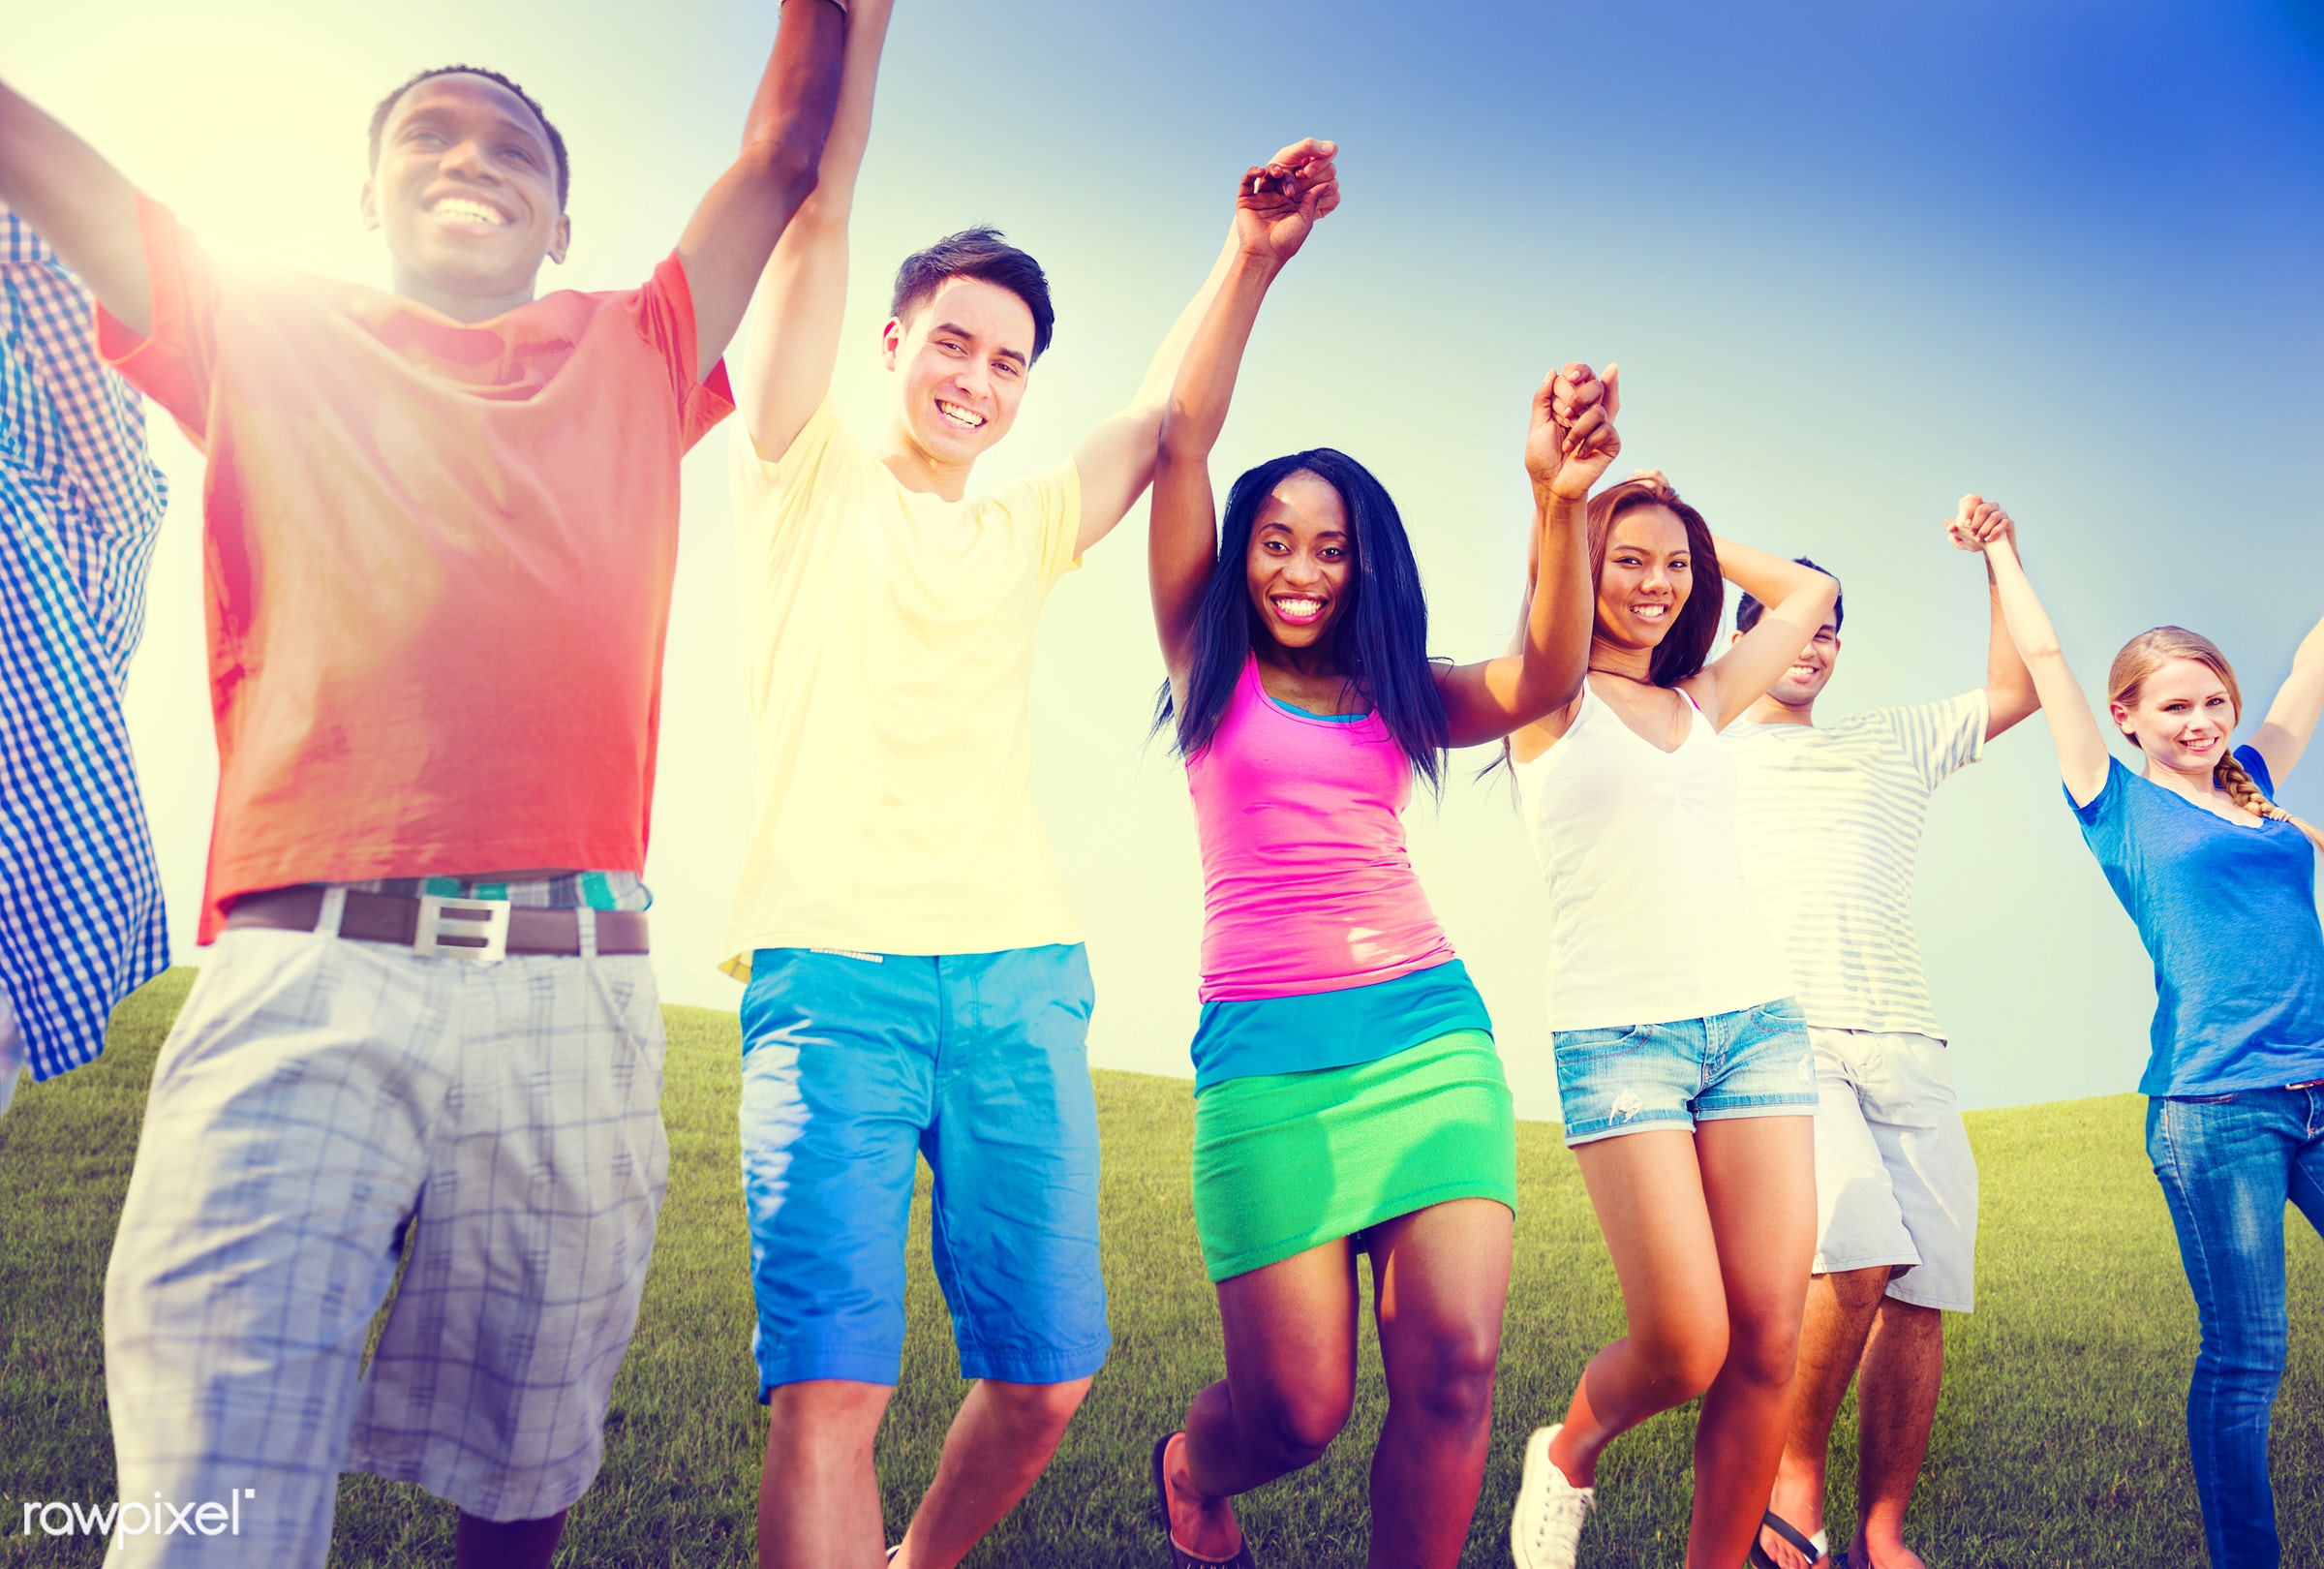 achieve, achievement, arms, arms raised, celebration, cheerful, communication, community, concepts, connection, field,...